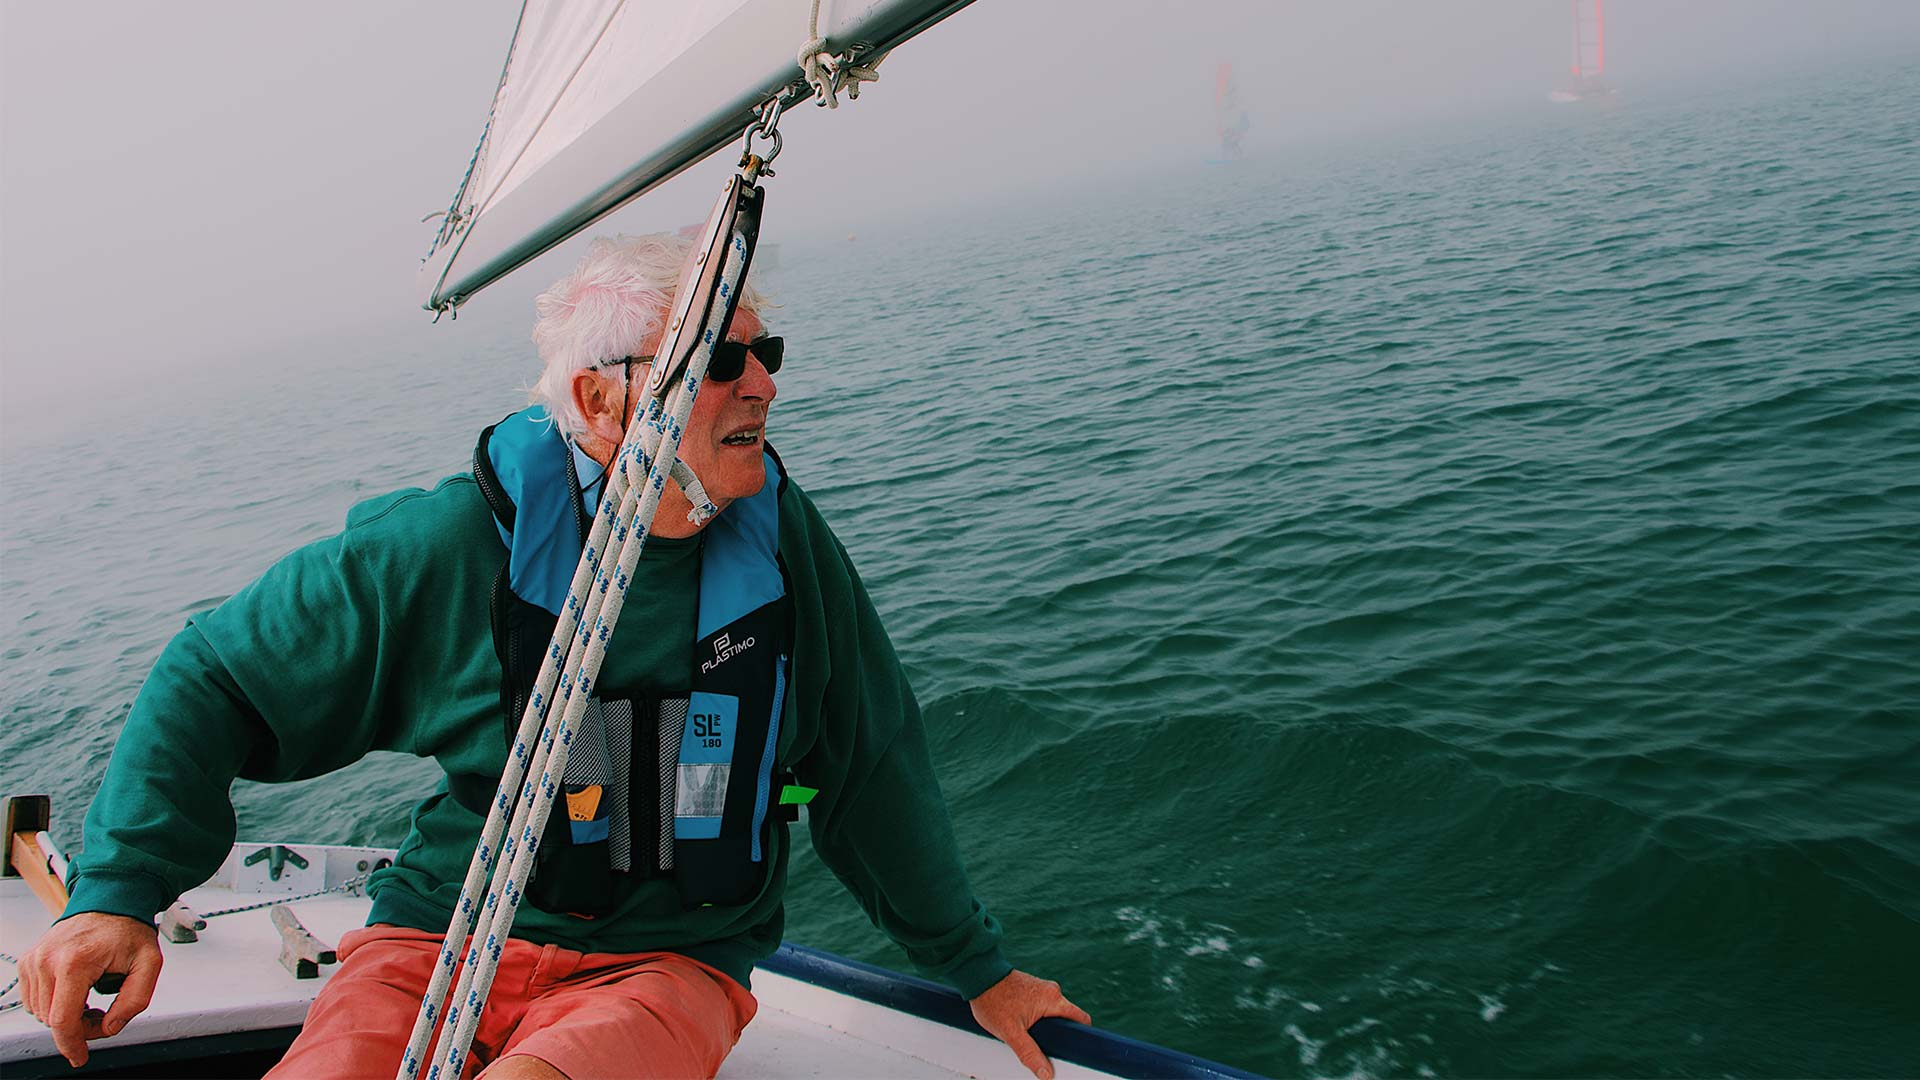 Elderly man sailing